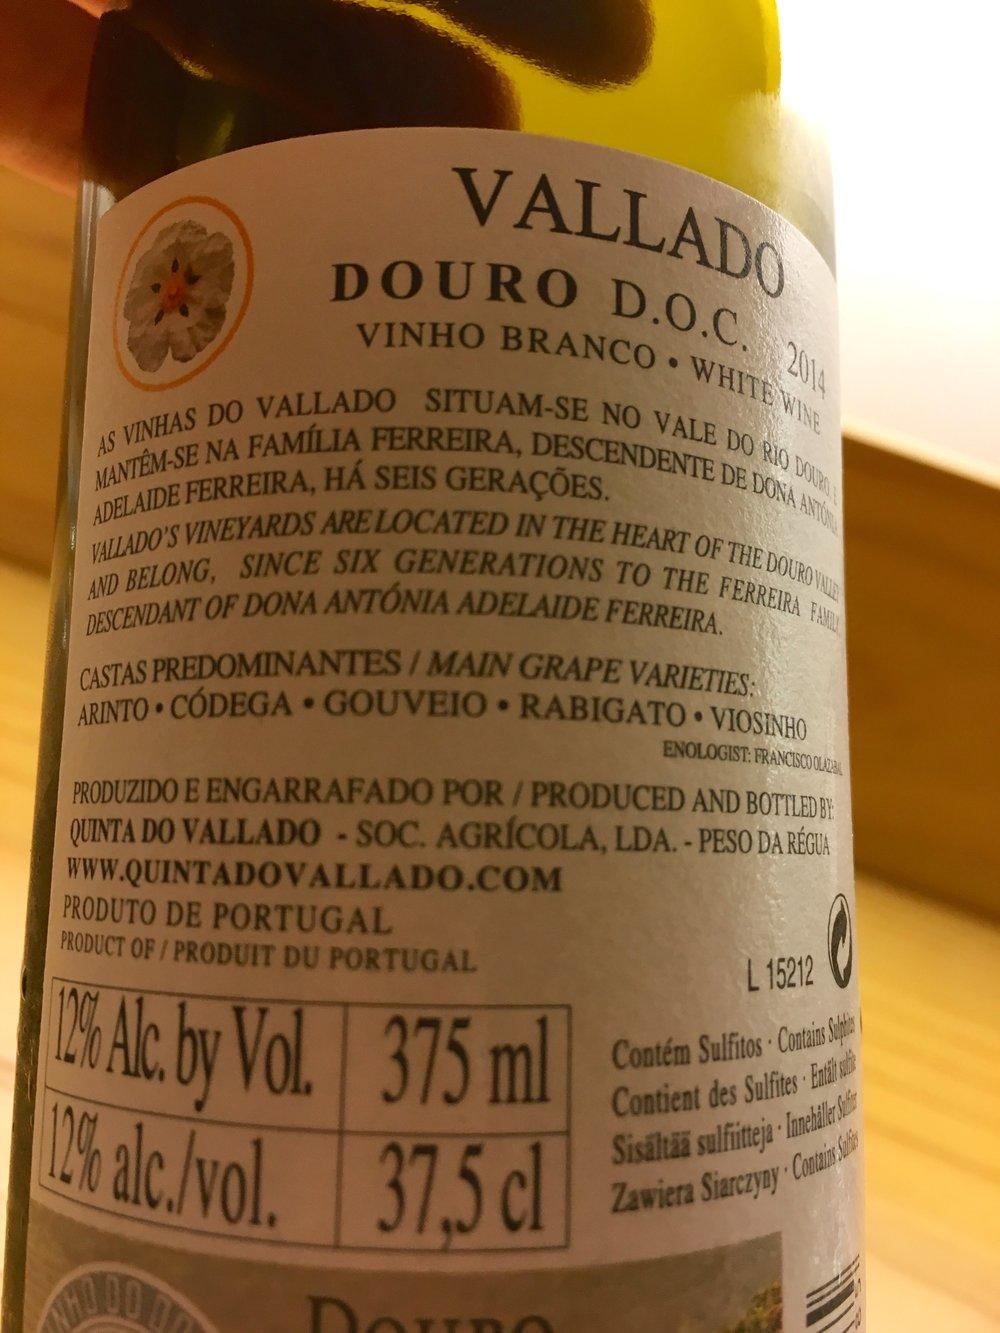 vinho branco (white blend)